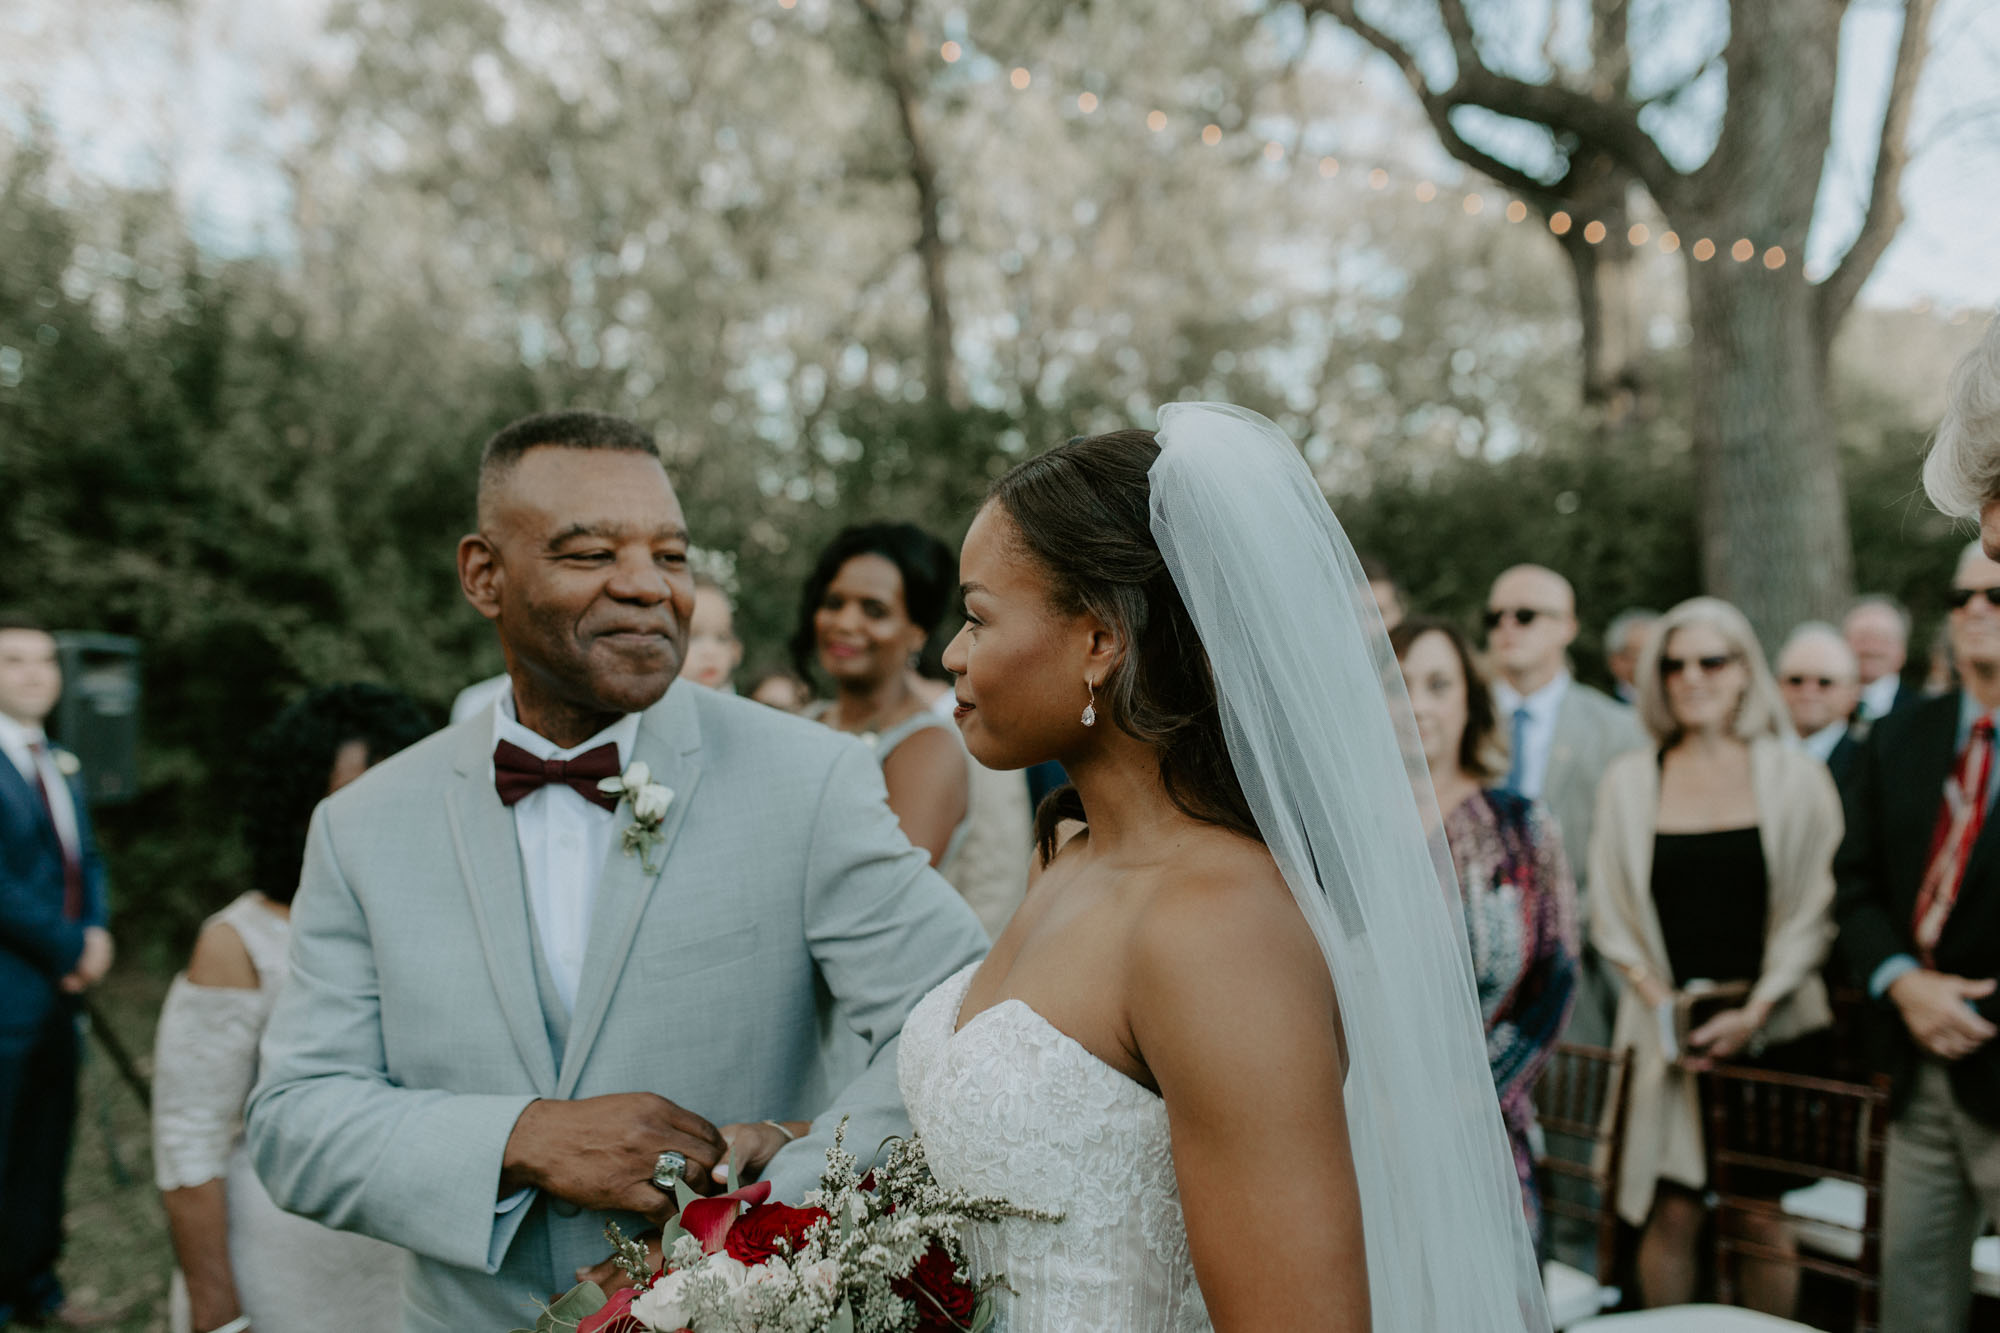 prairie_glass_house_wedding_champaign_wright_photographs_simon_0078.jpg